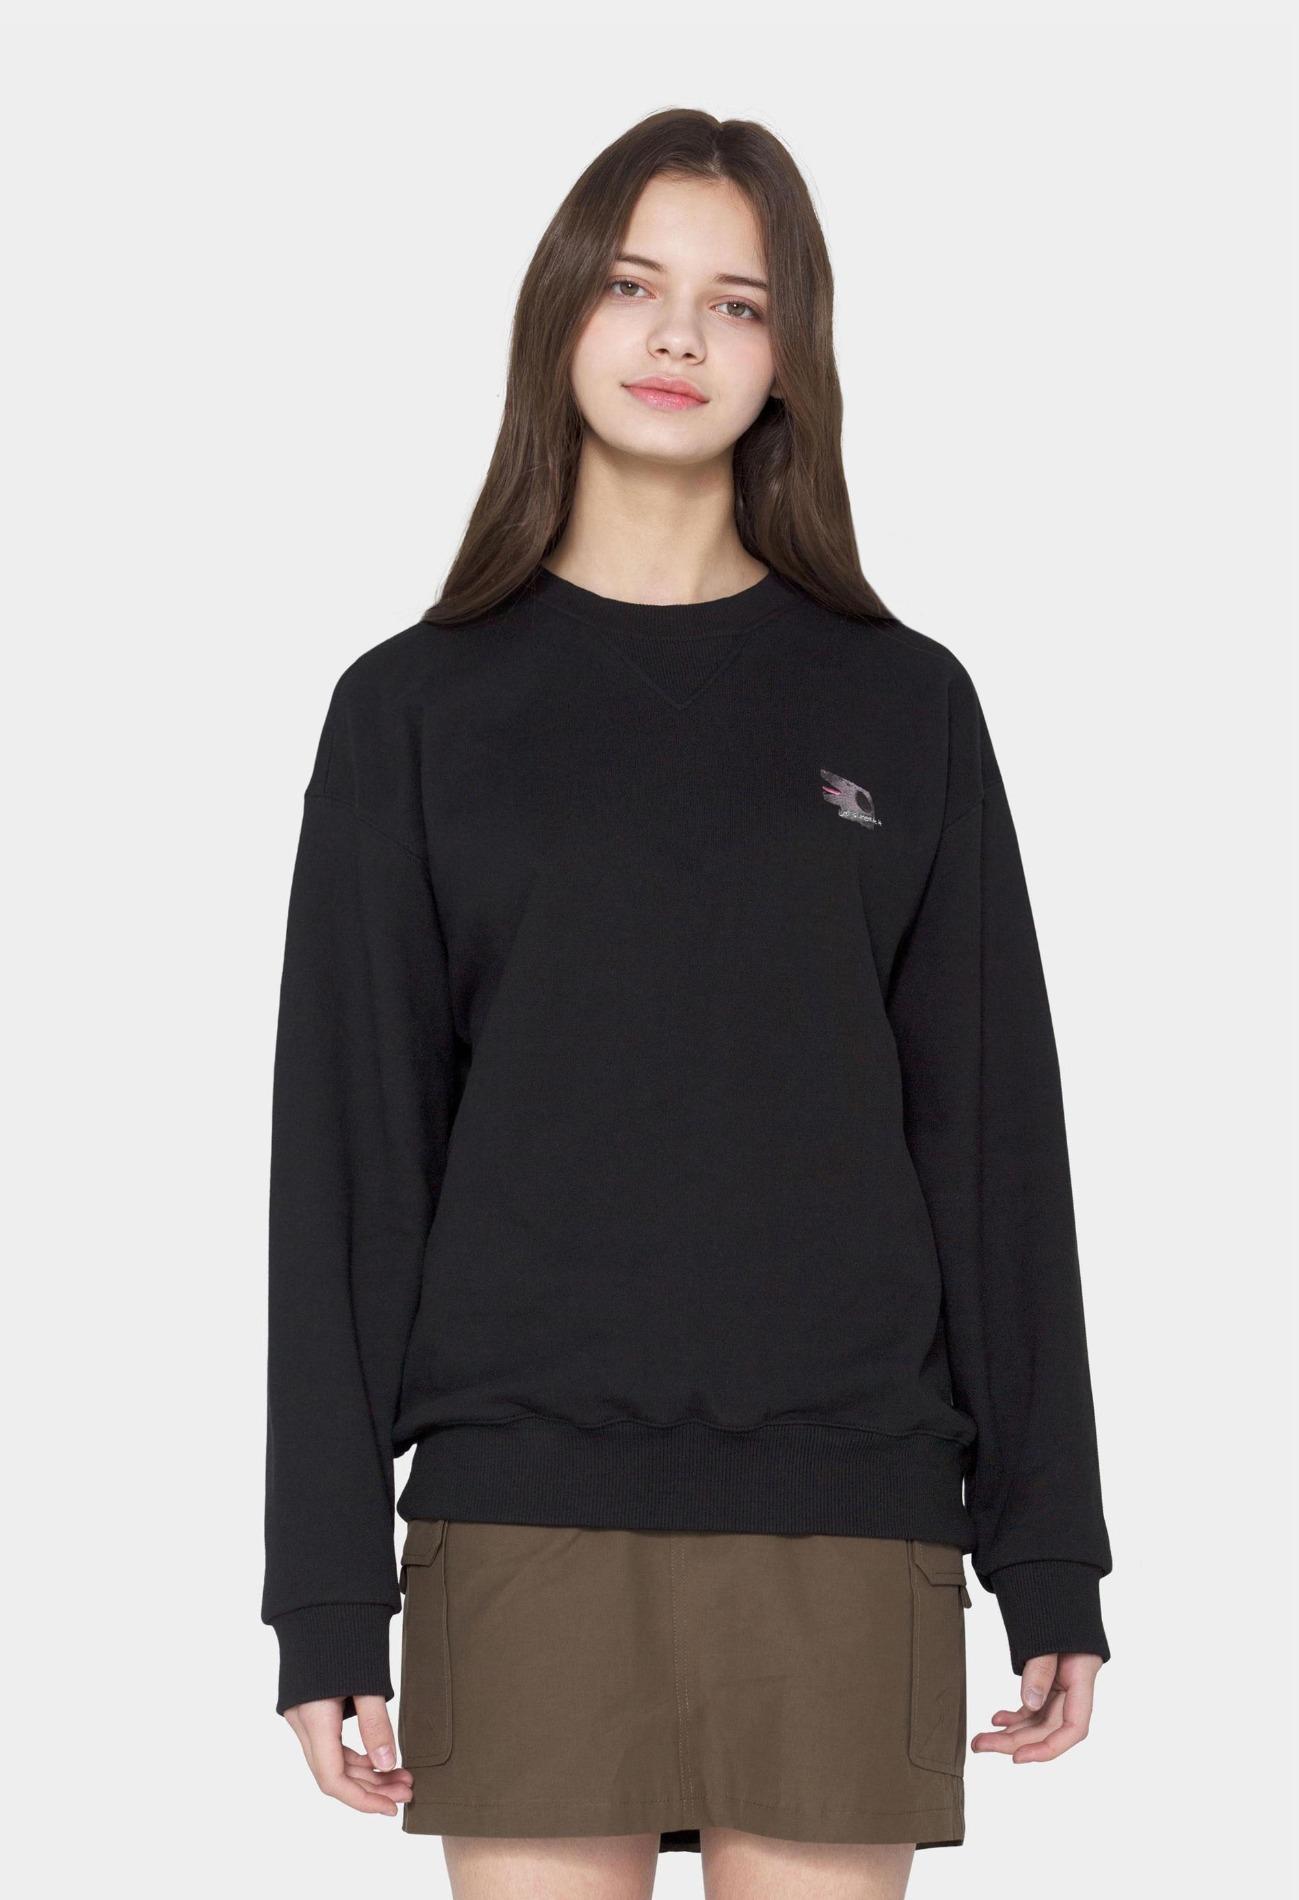 keek [Unisex] Doggy Sweatshirts - Black 스트릿패션 유니섹스브랜드 커플시밀러룩 남자쇼핑몰 여성의류쇼핑몰 후드티 힙색